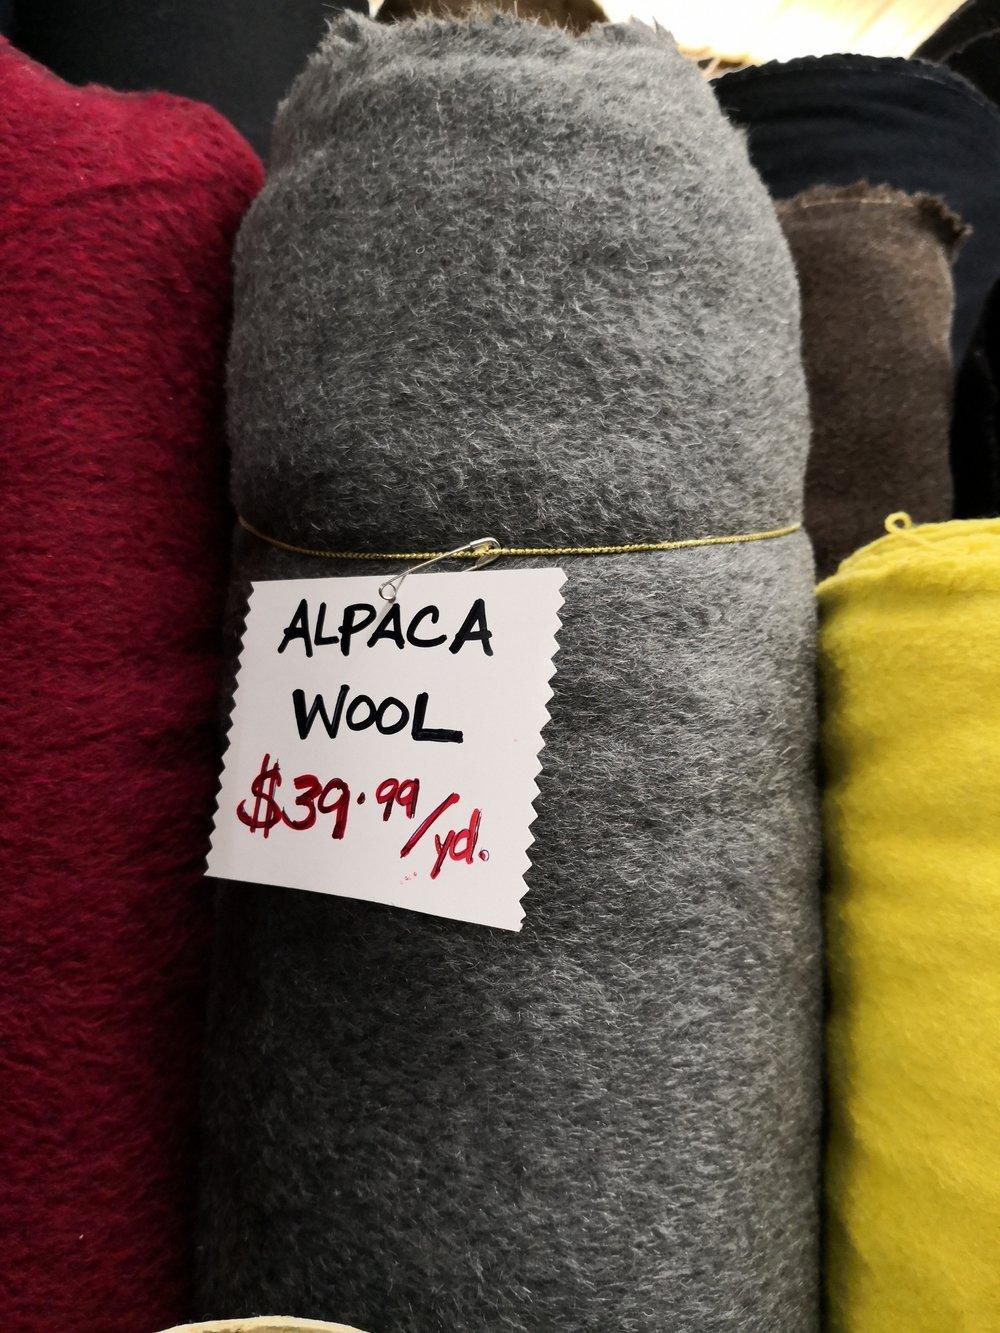 Alpaca wool at King Textile